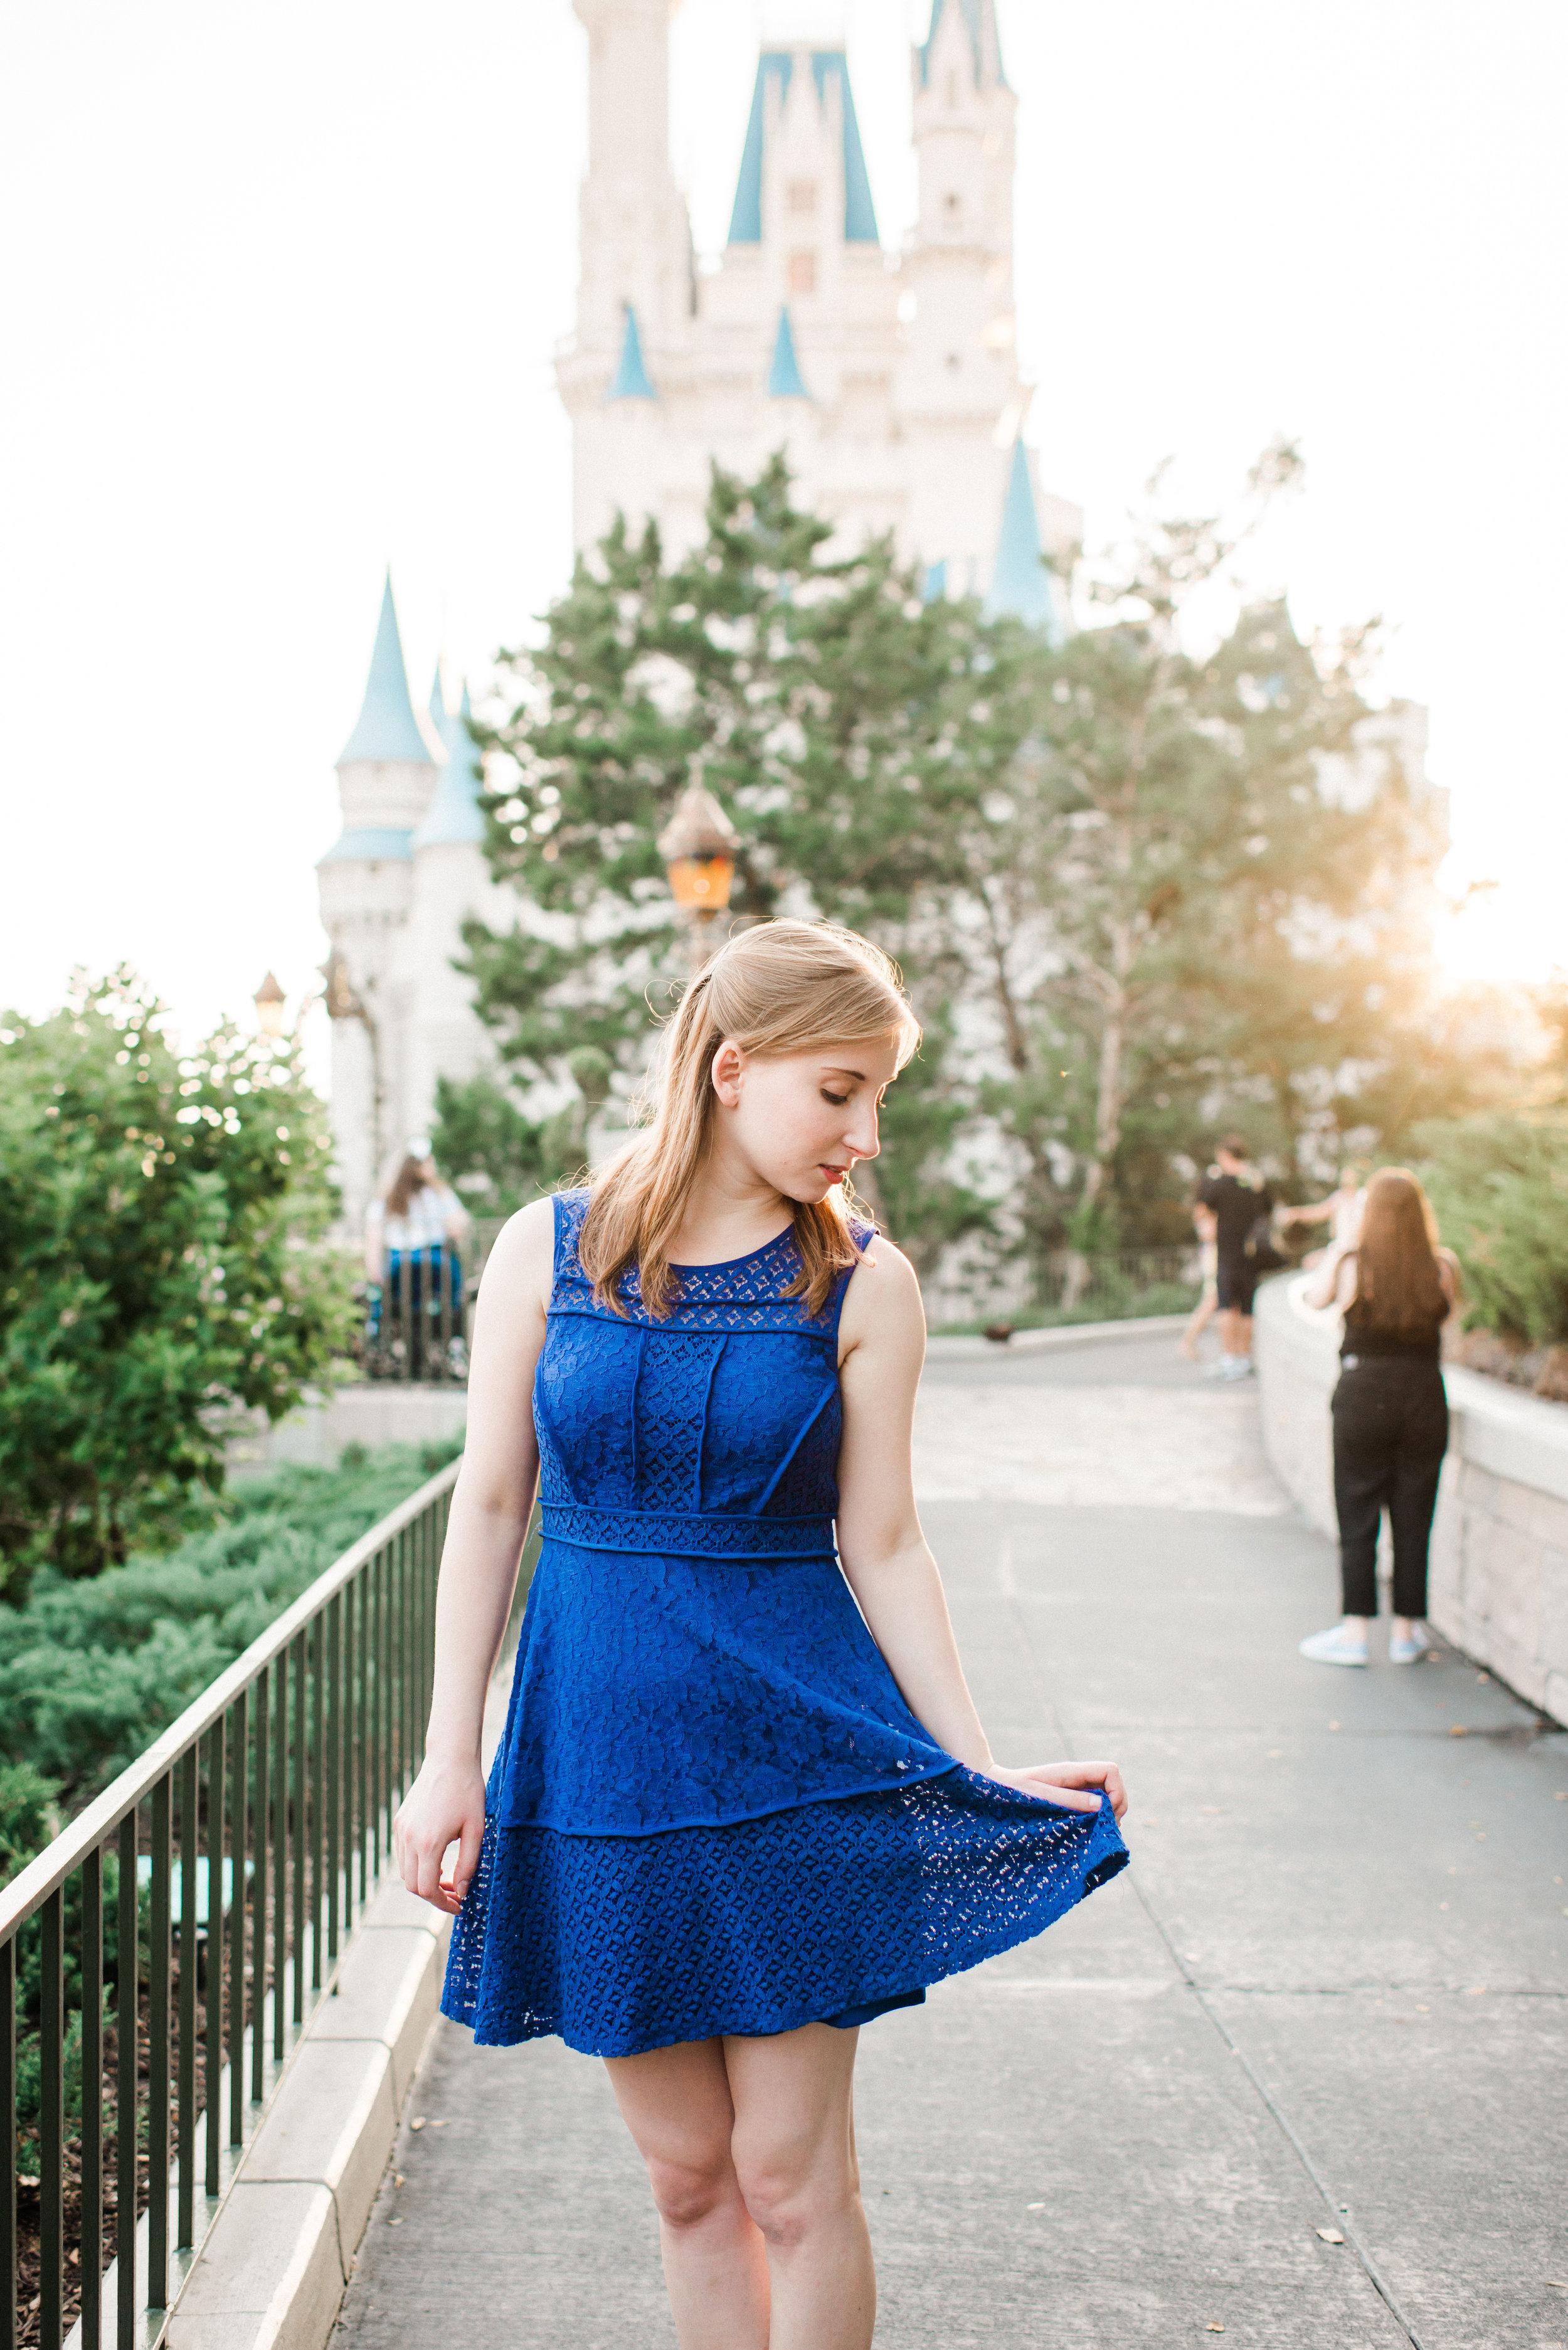 KateTaramykinStudios-Disney-World-Magic-Kingdom-Portraits-Jess-15.jpg